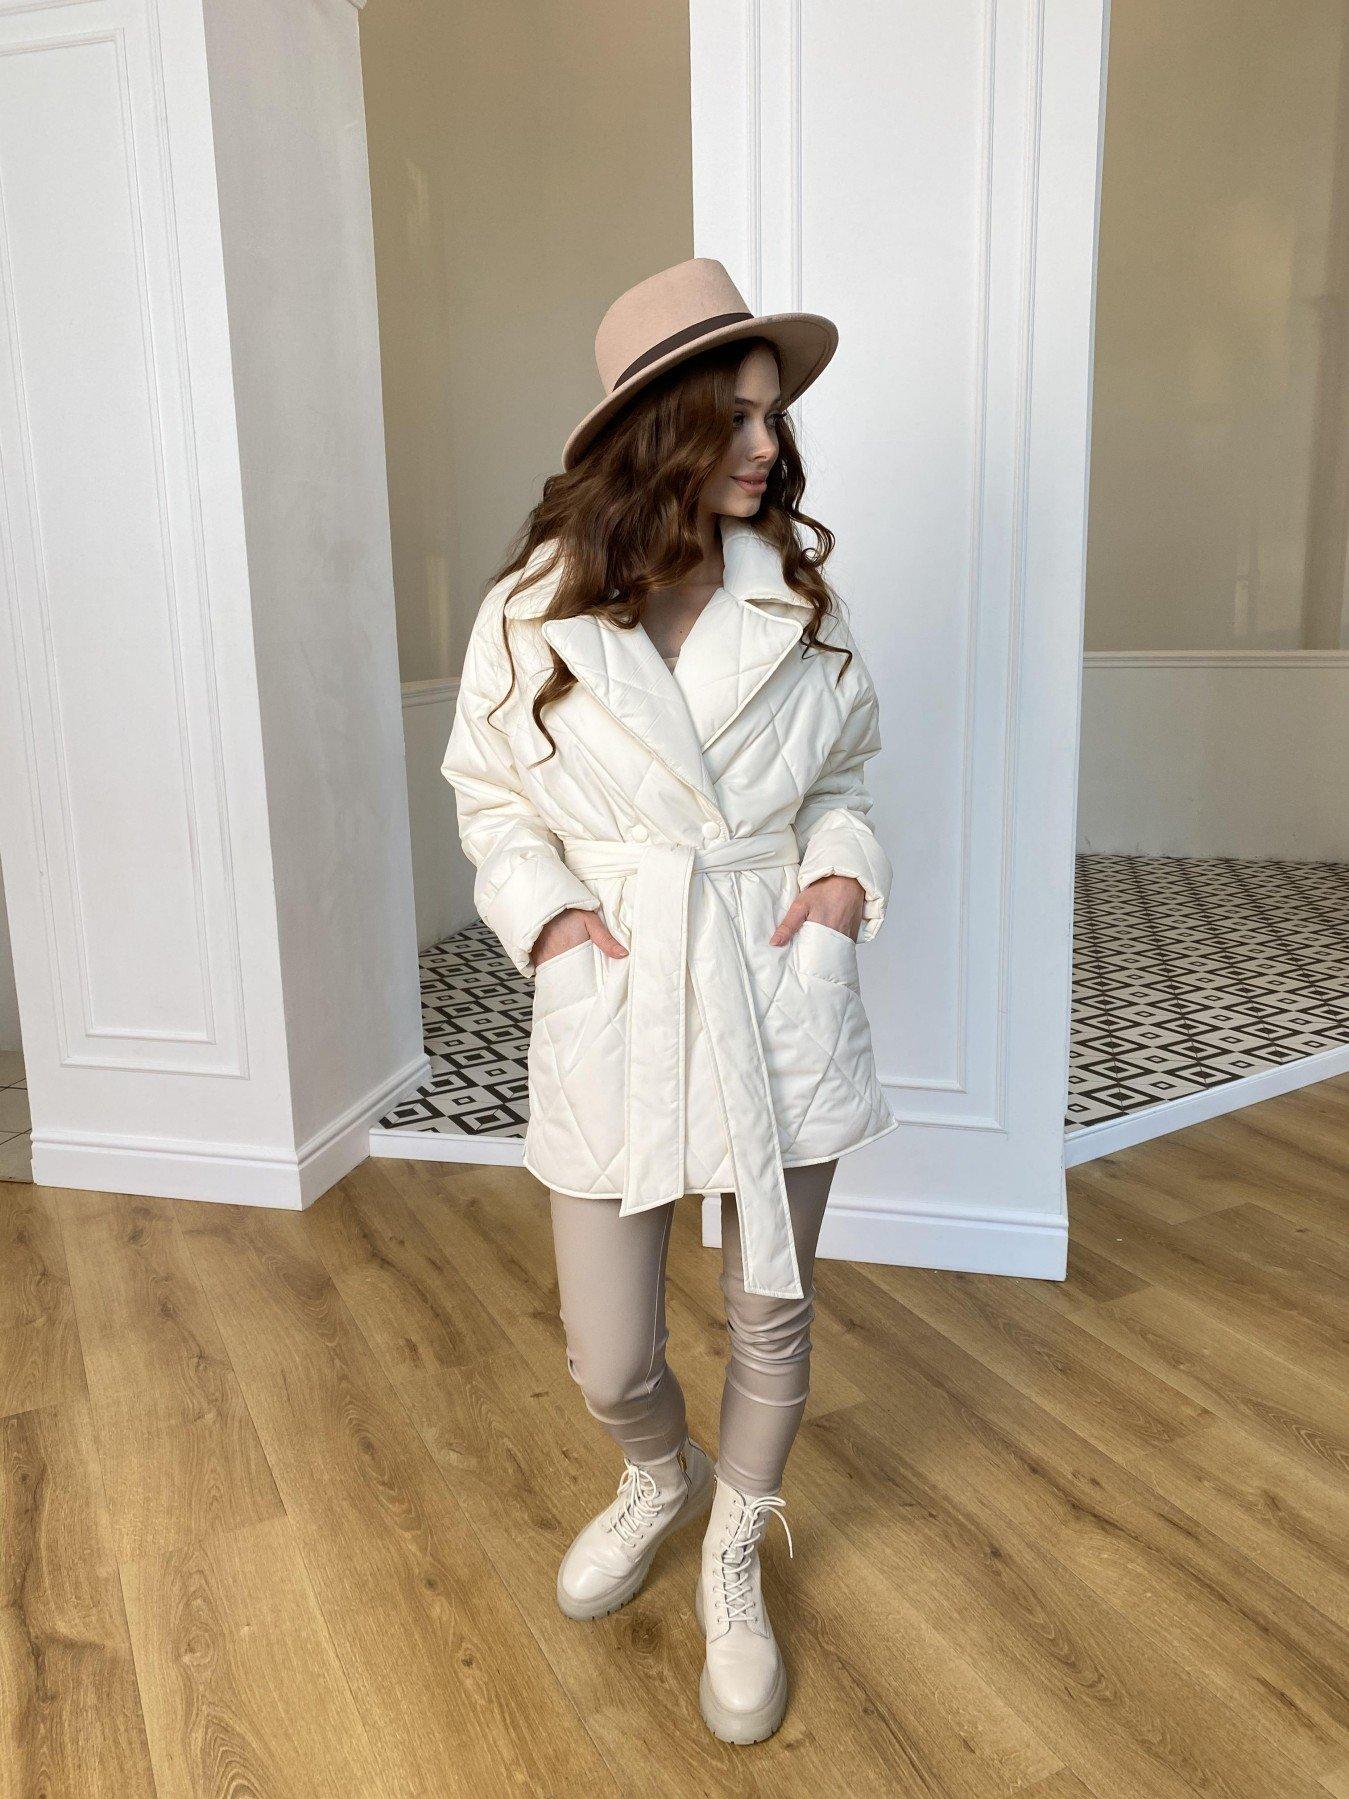 Норд Бат стеганая куртка из плащевки Ammy  10947 АРТ. 47435 Цвет: Молоко - фото 7, интернет магазин tm-modus.ru